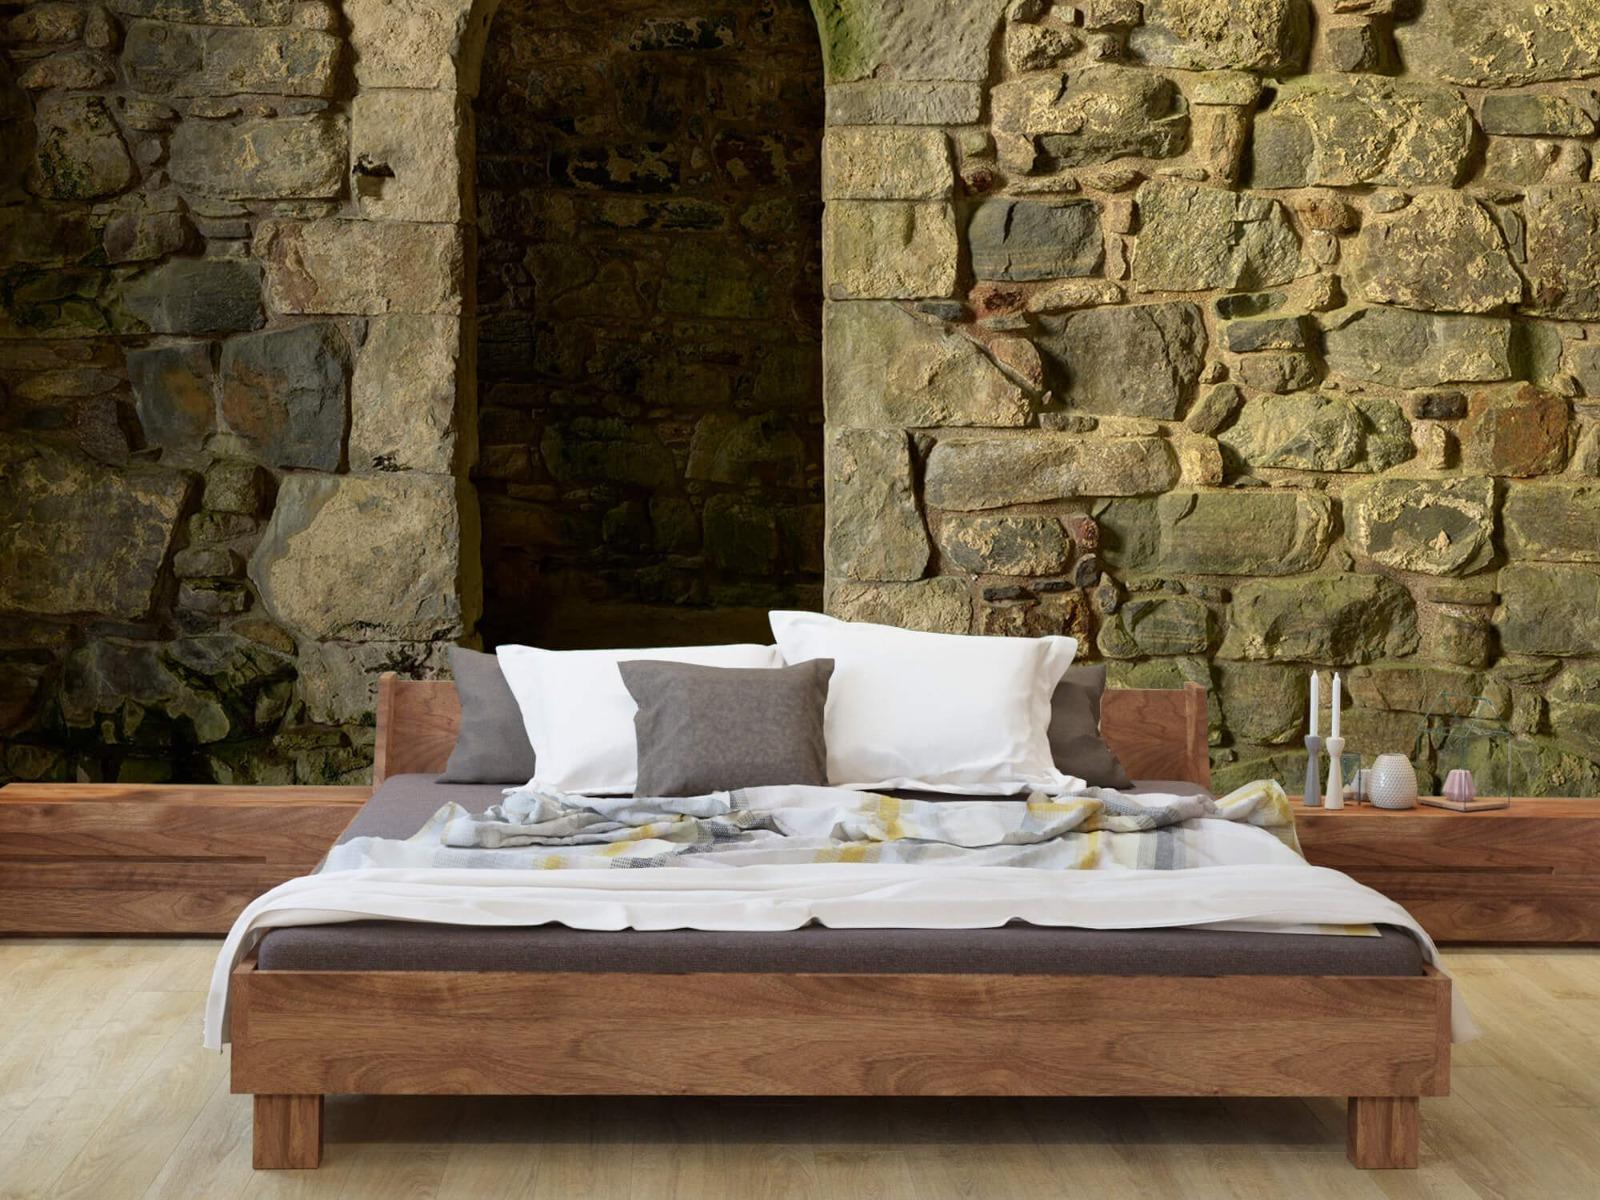 Steen behang - Oude muur met doorgang - Slaapkamer 8